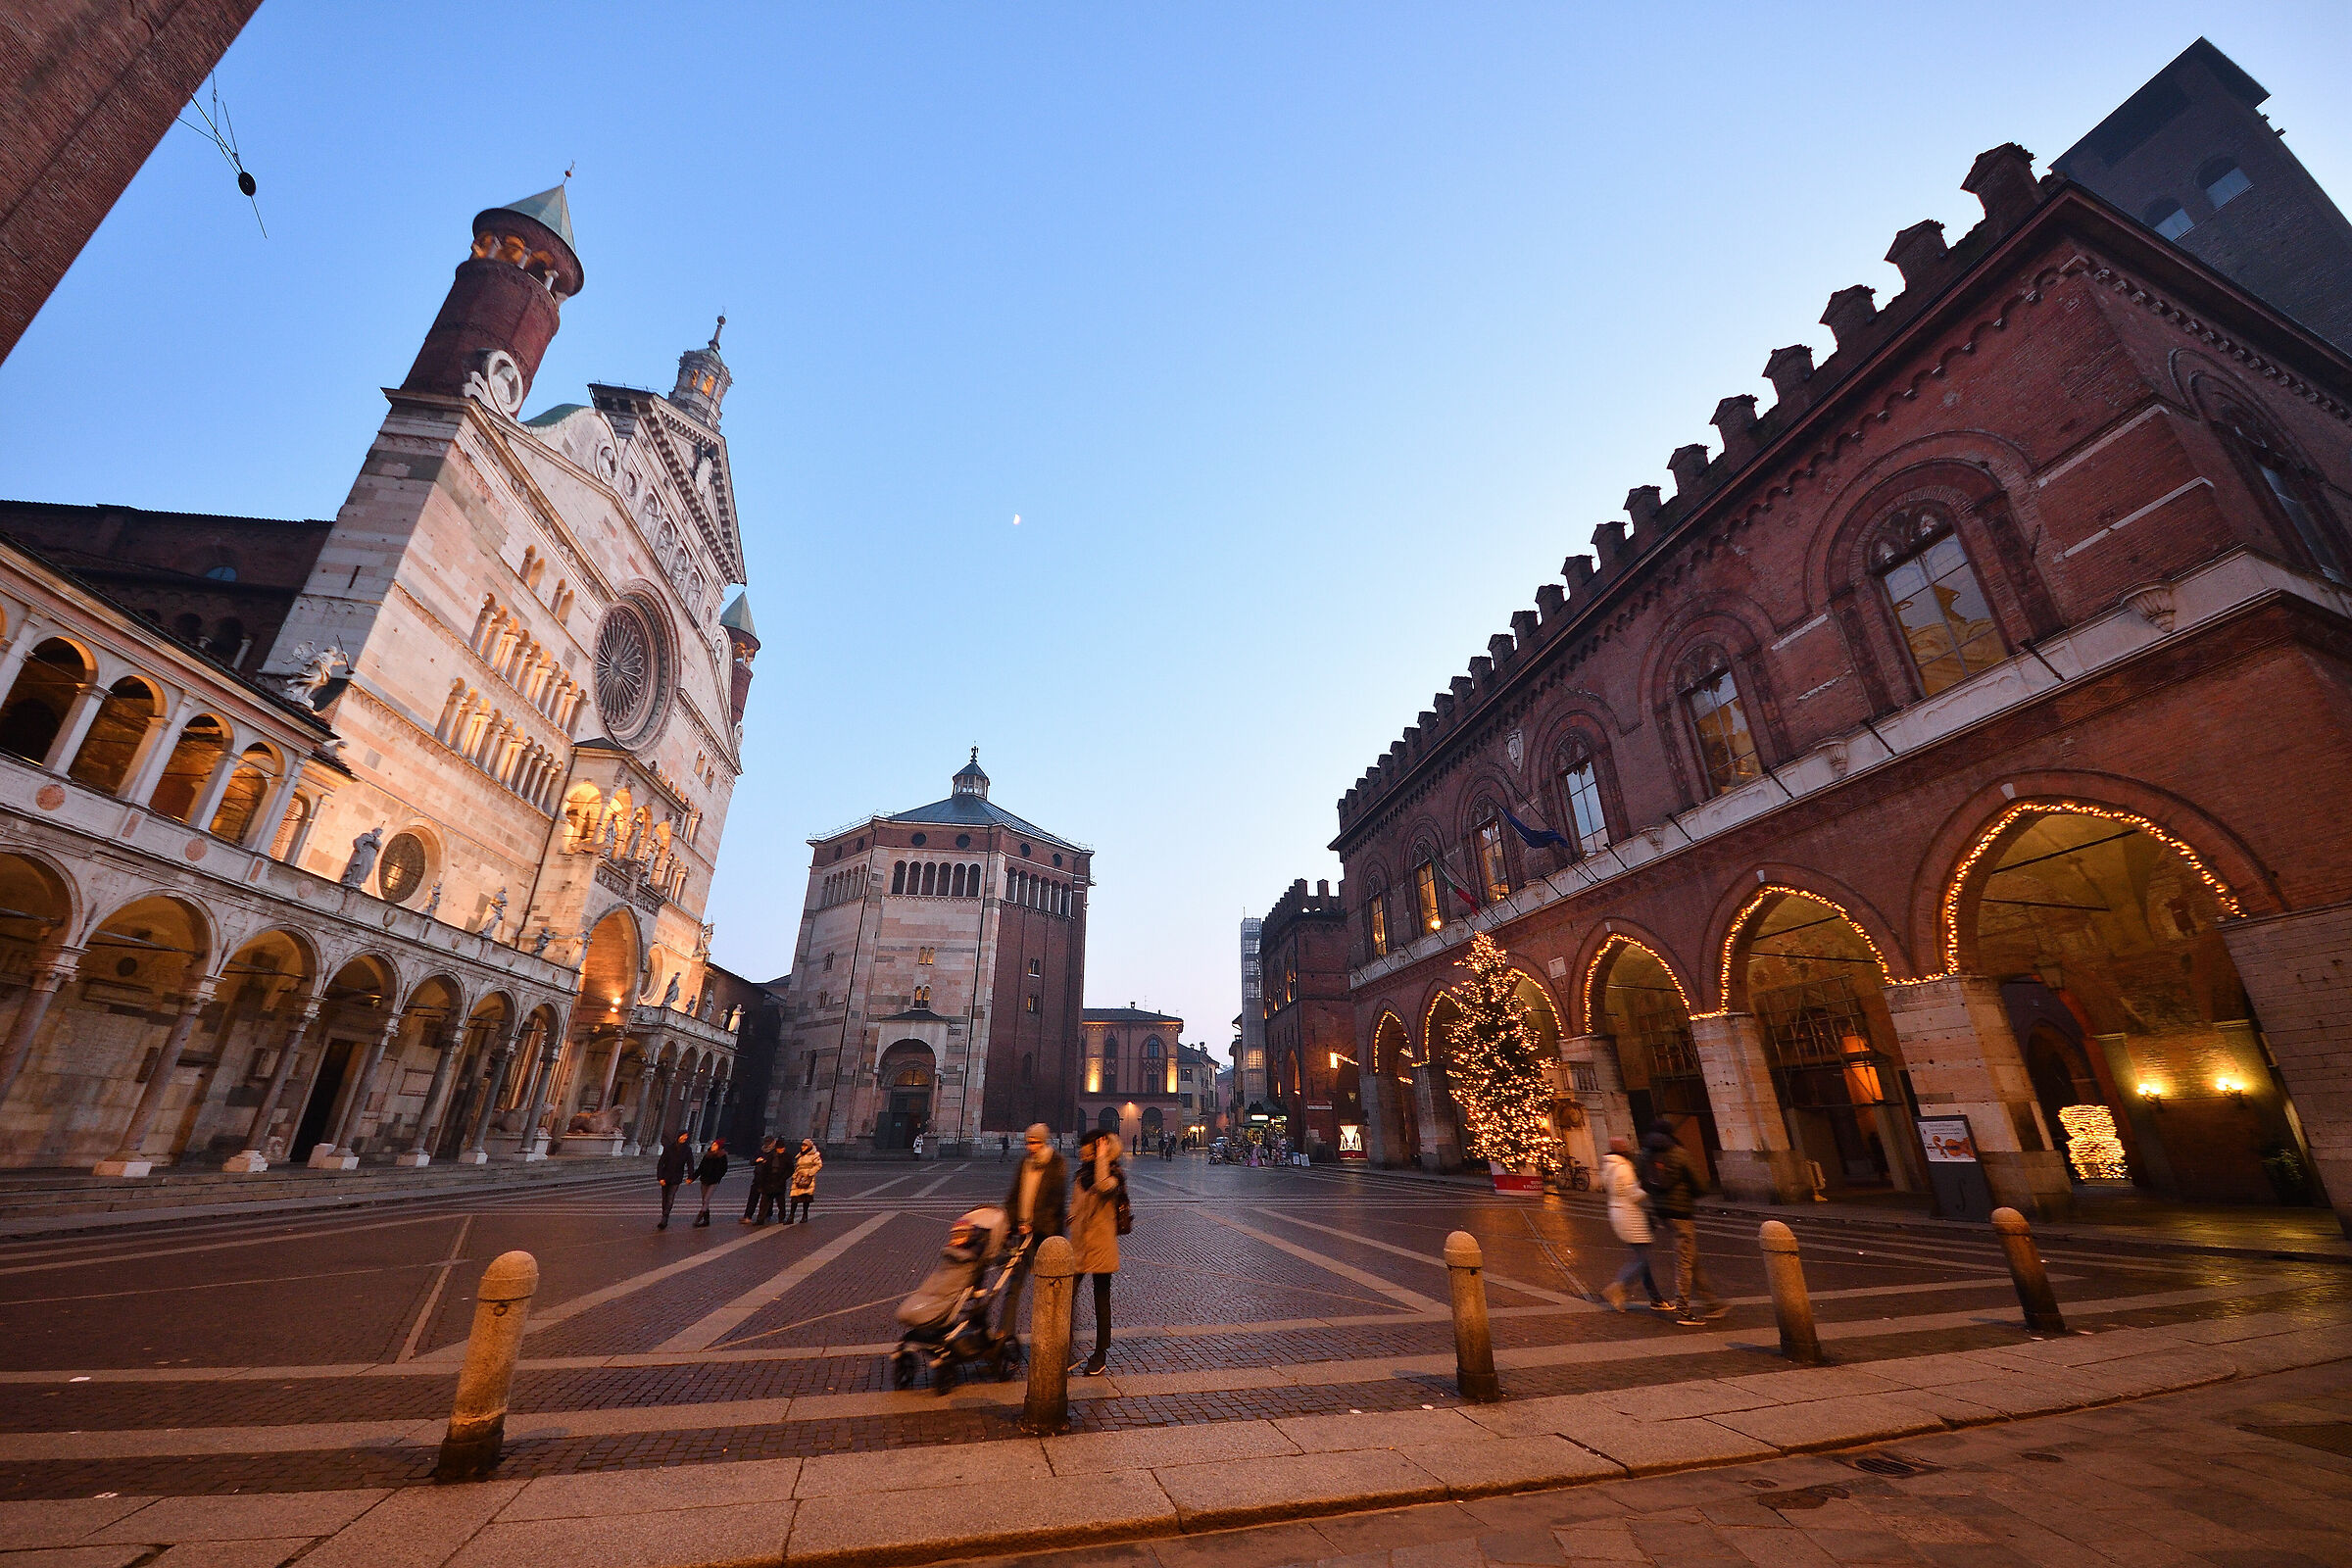 Town Hall...